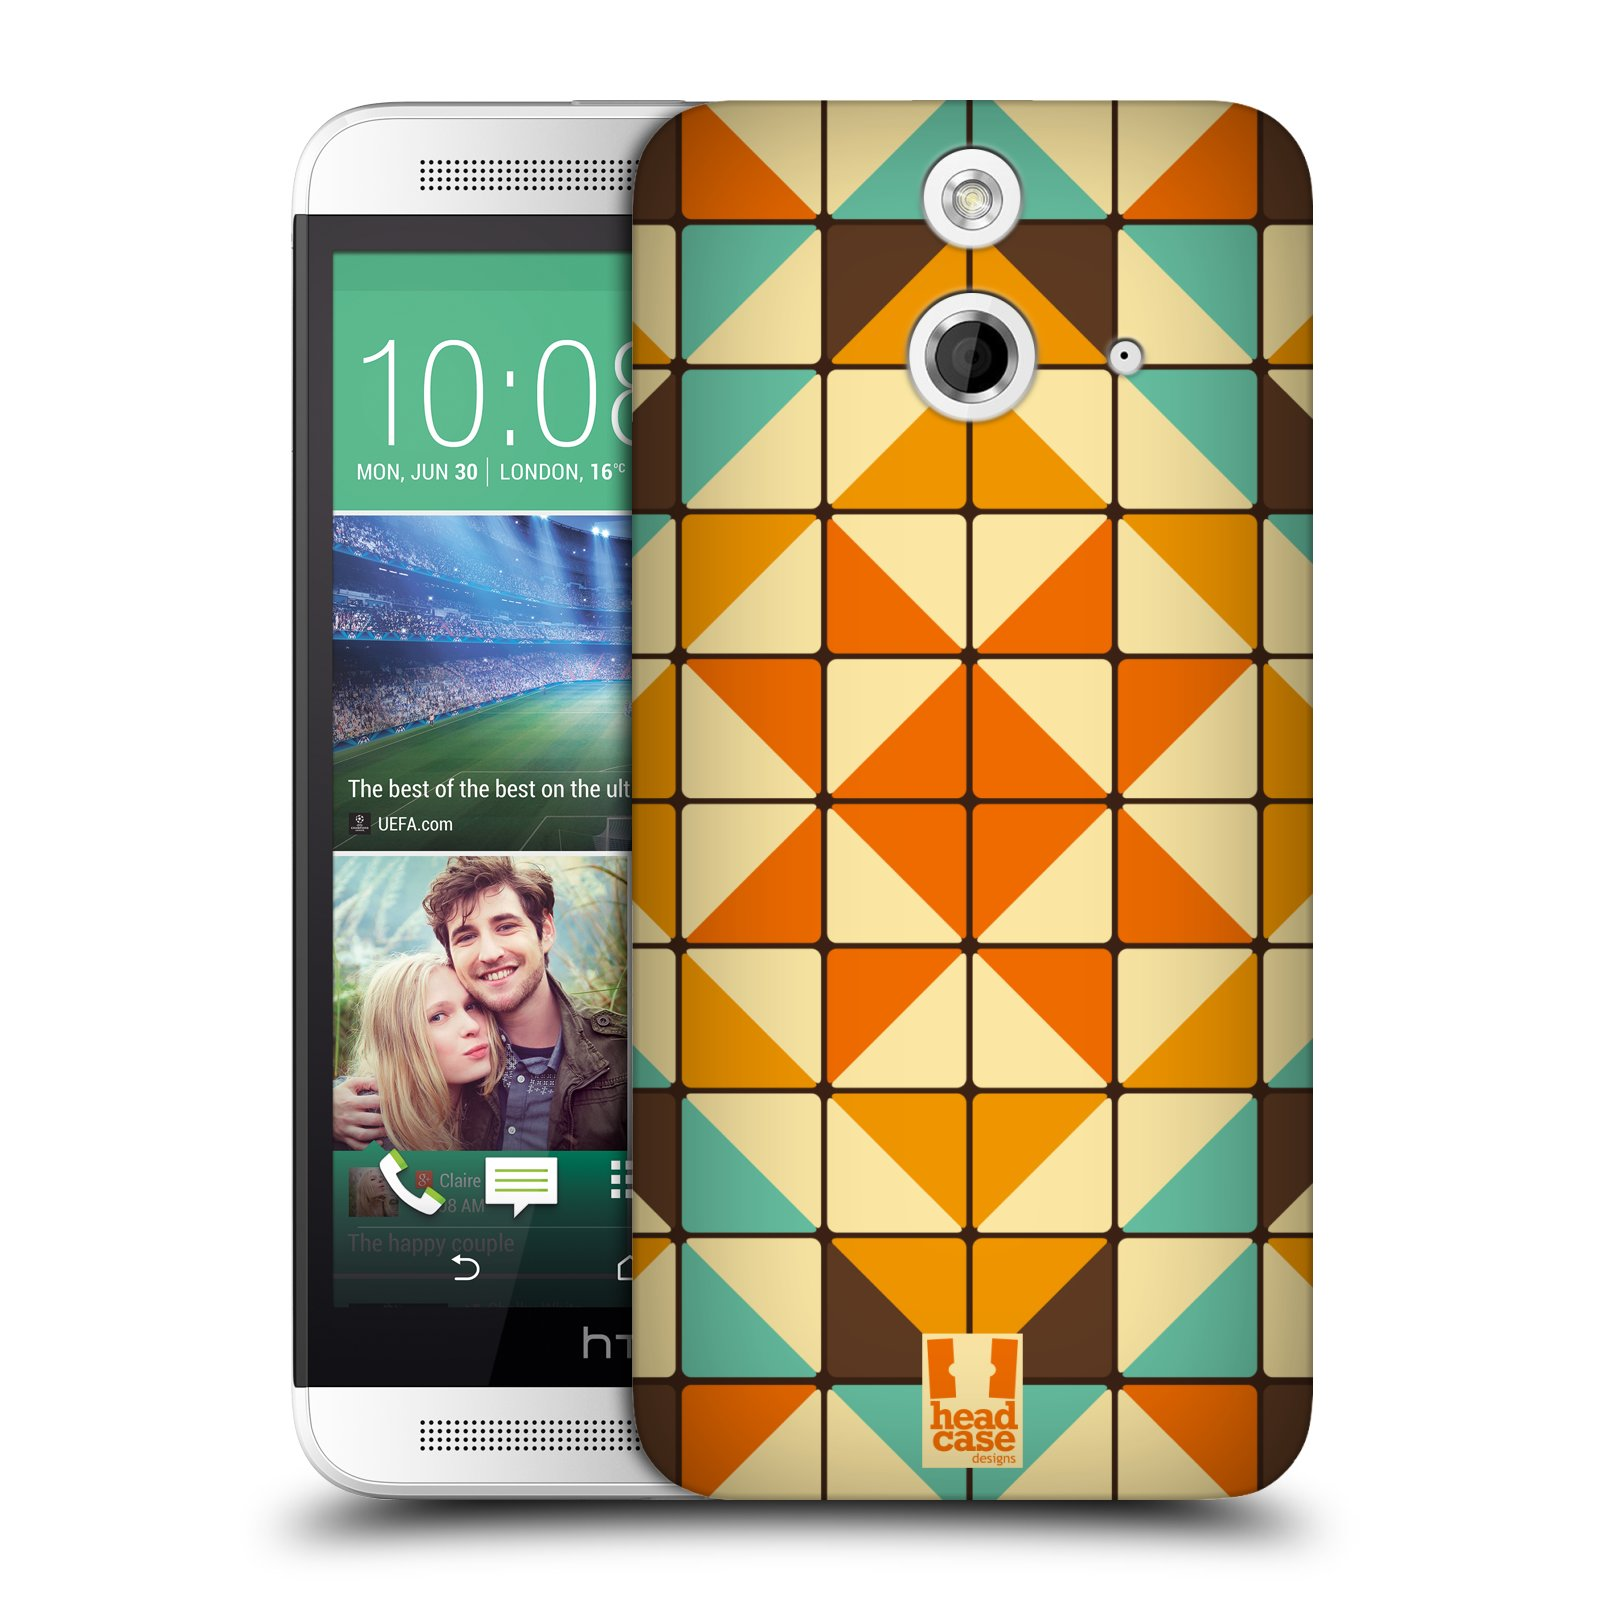 HEAD CASE DESIGNS GEOMETRIC BLOCKS HARD BACK CASE FOR HTC ONE E8 LTE